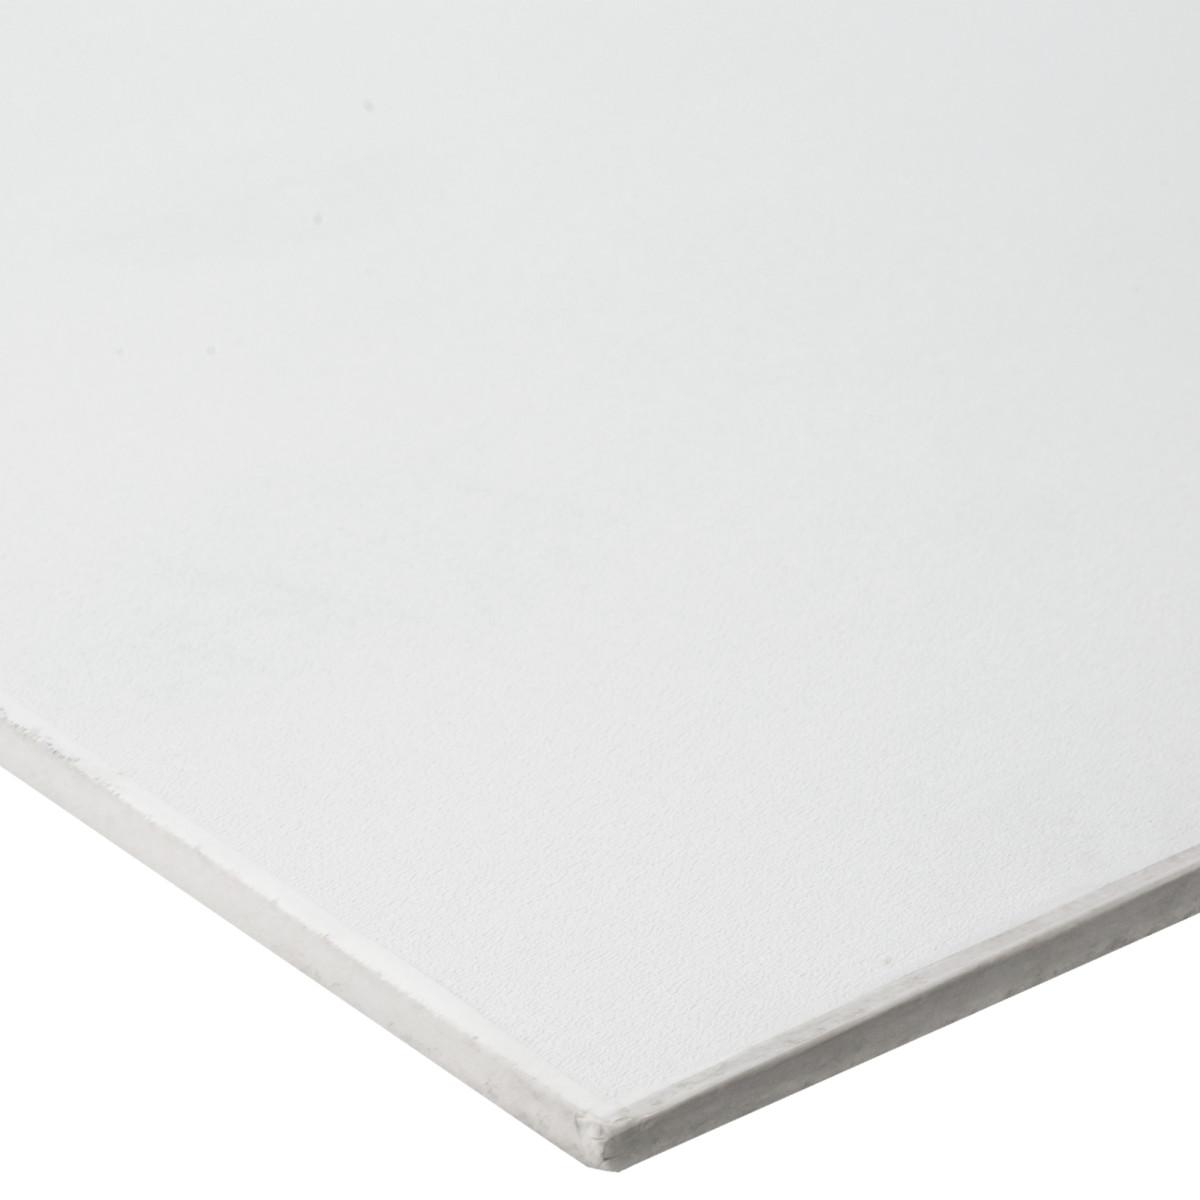 Лист стекломагниевый Magelan Премиум 2440x1220x10 мм